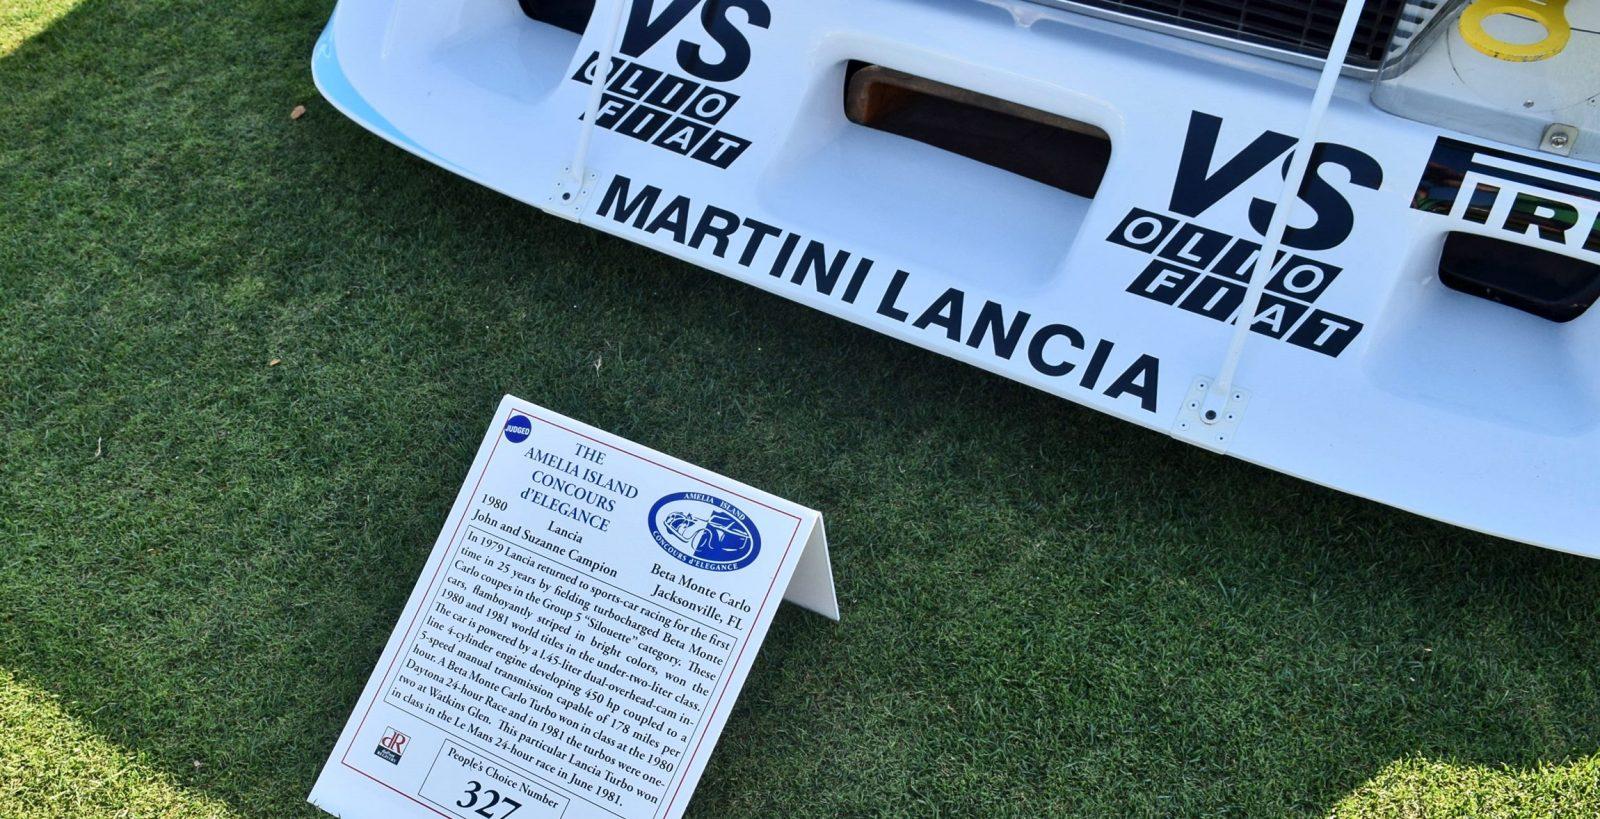 1981 Lancia BETA Monte Carlo Turbo 4